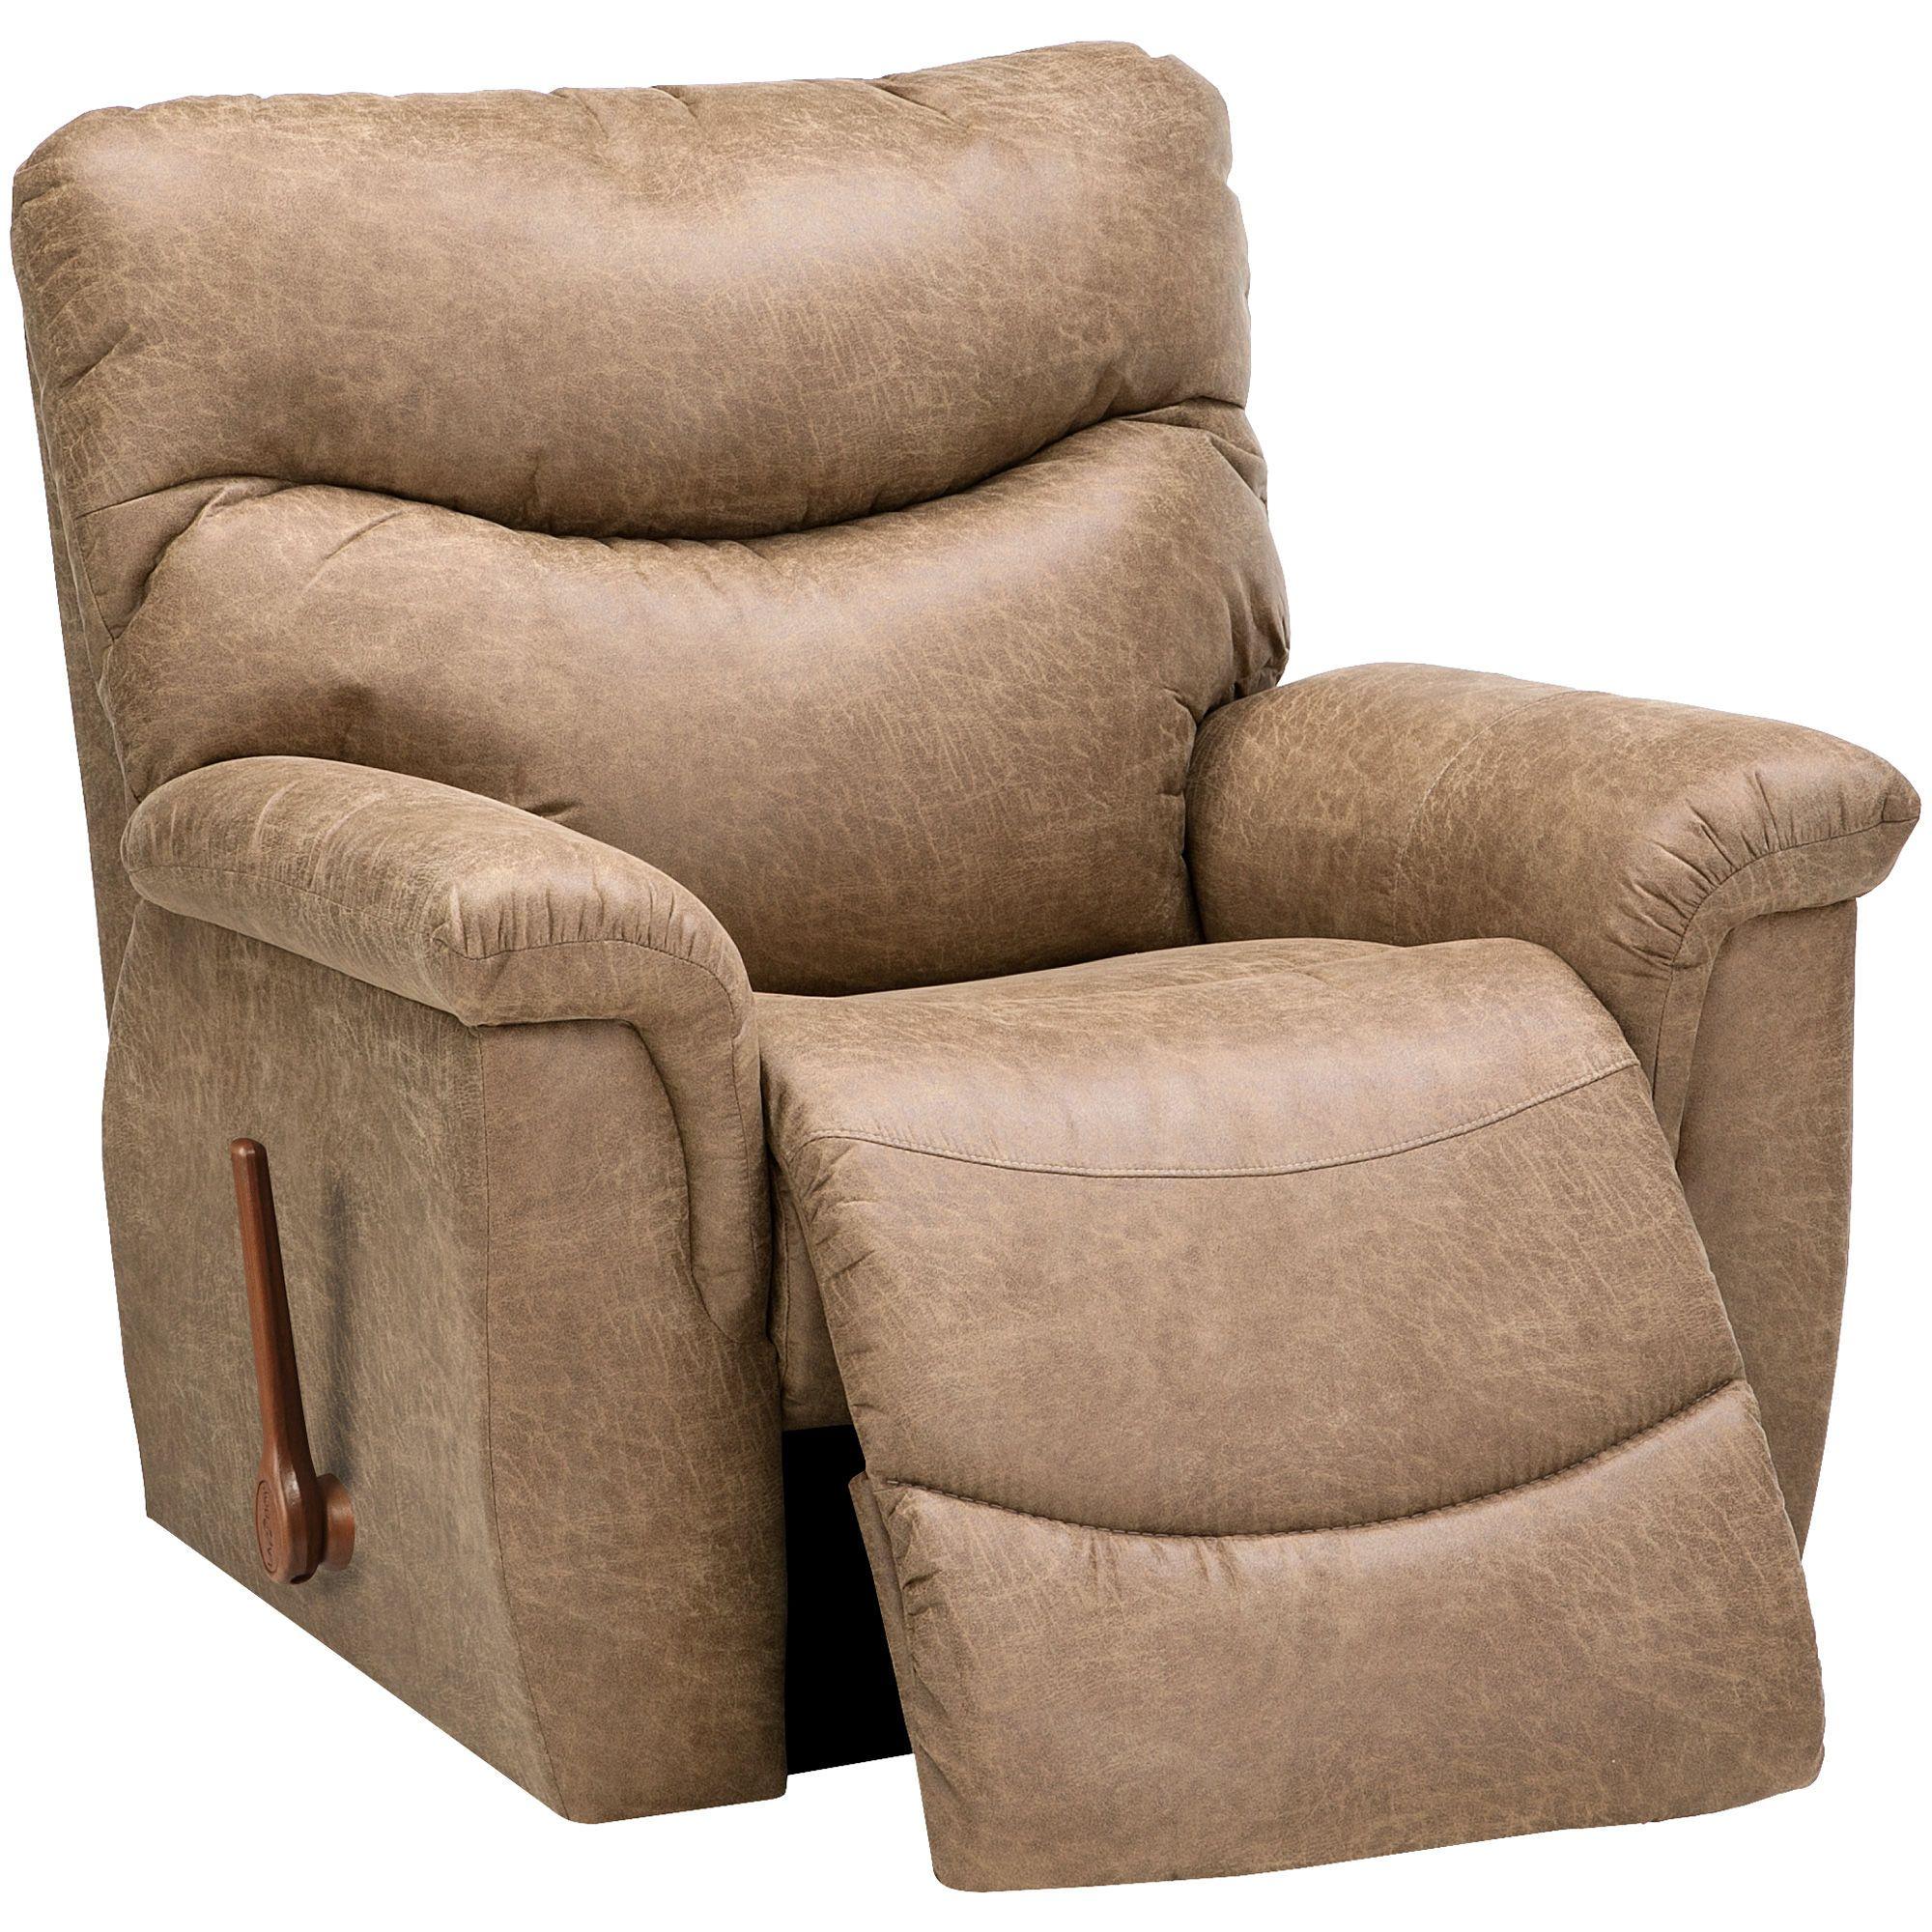 Slumberland Furniture La Z Boy James Steel Rocker Recliner